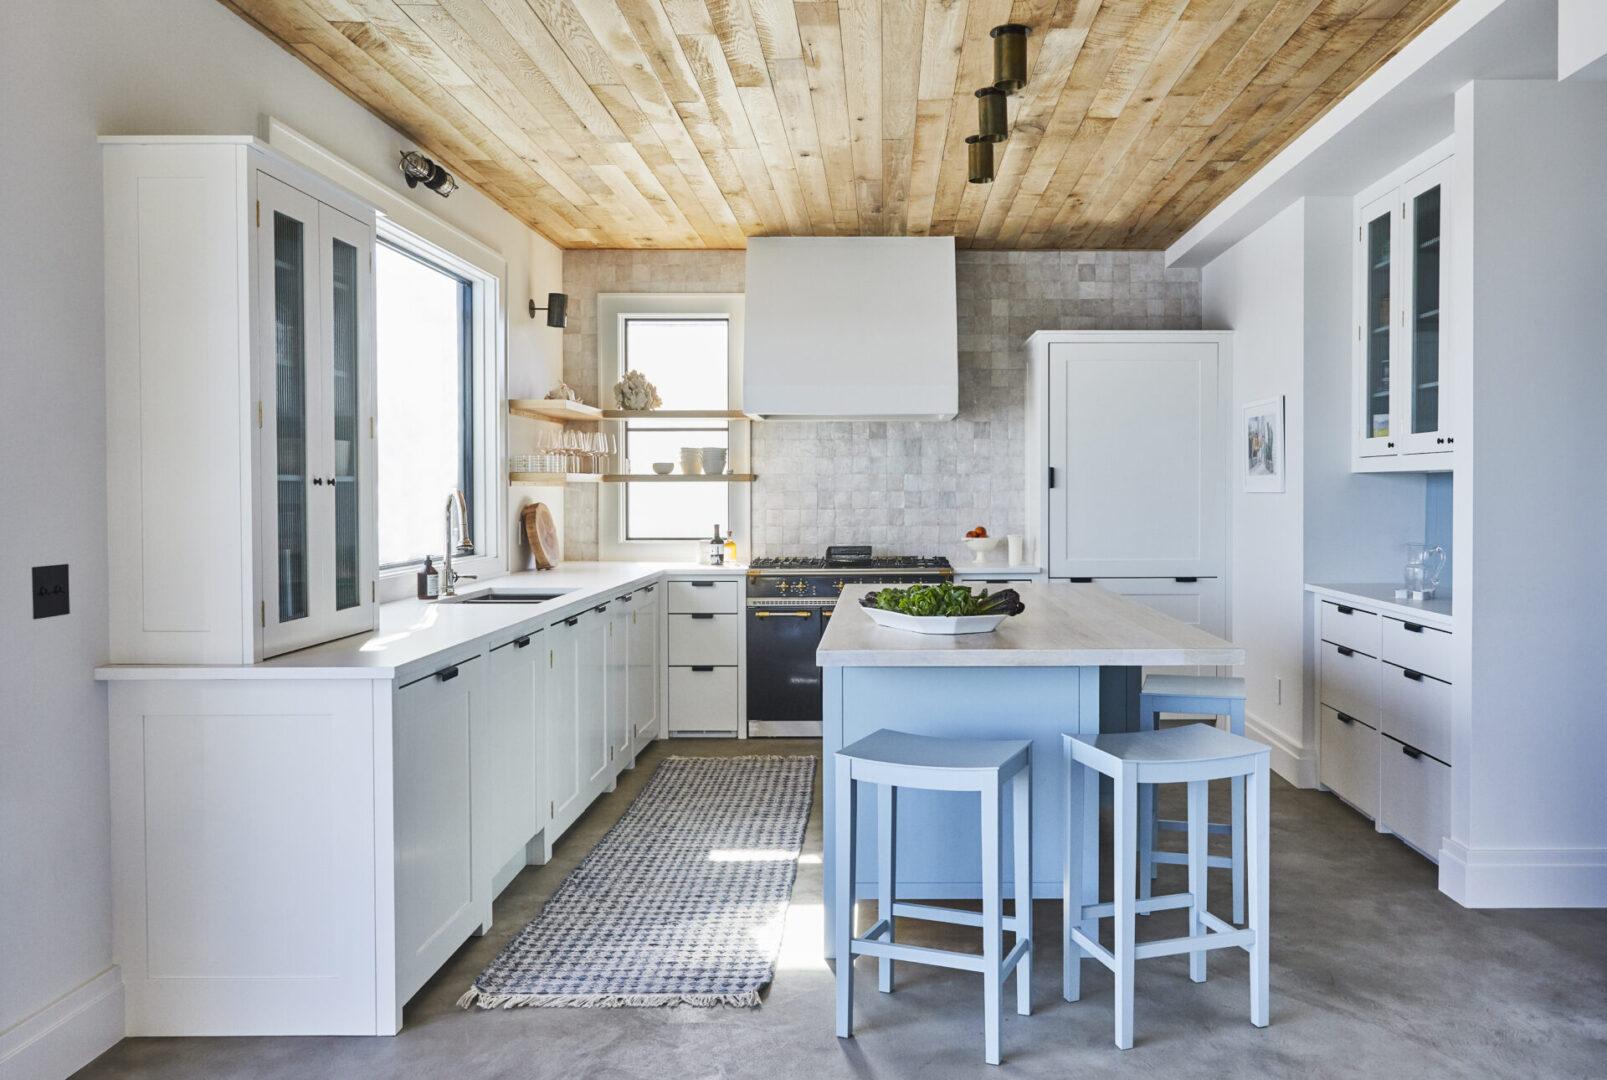 36Harbor_kitchen_092820_469